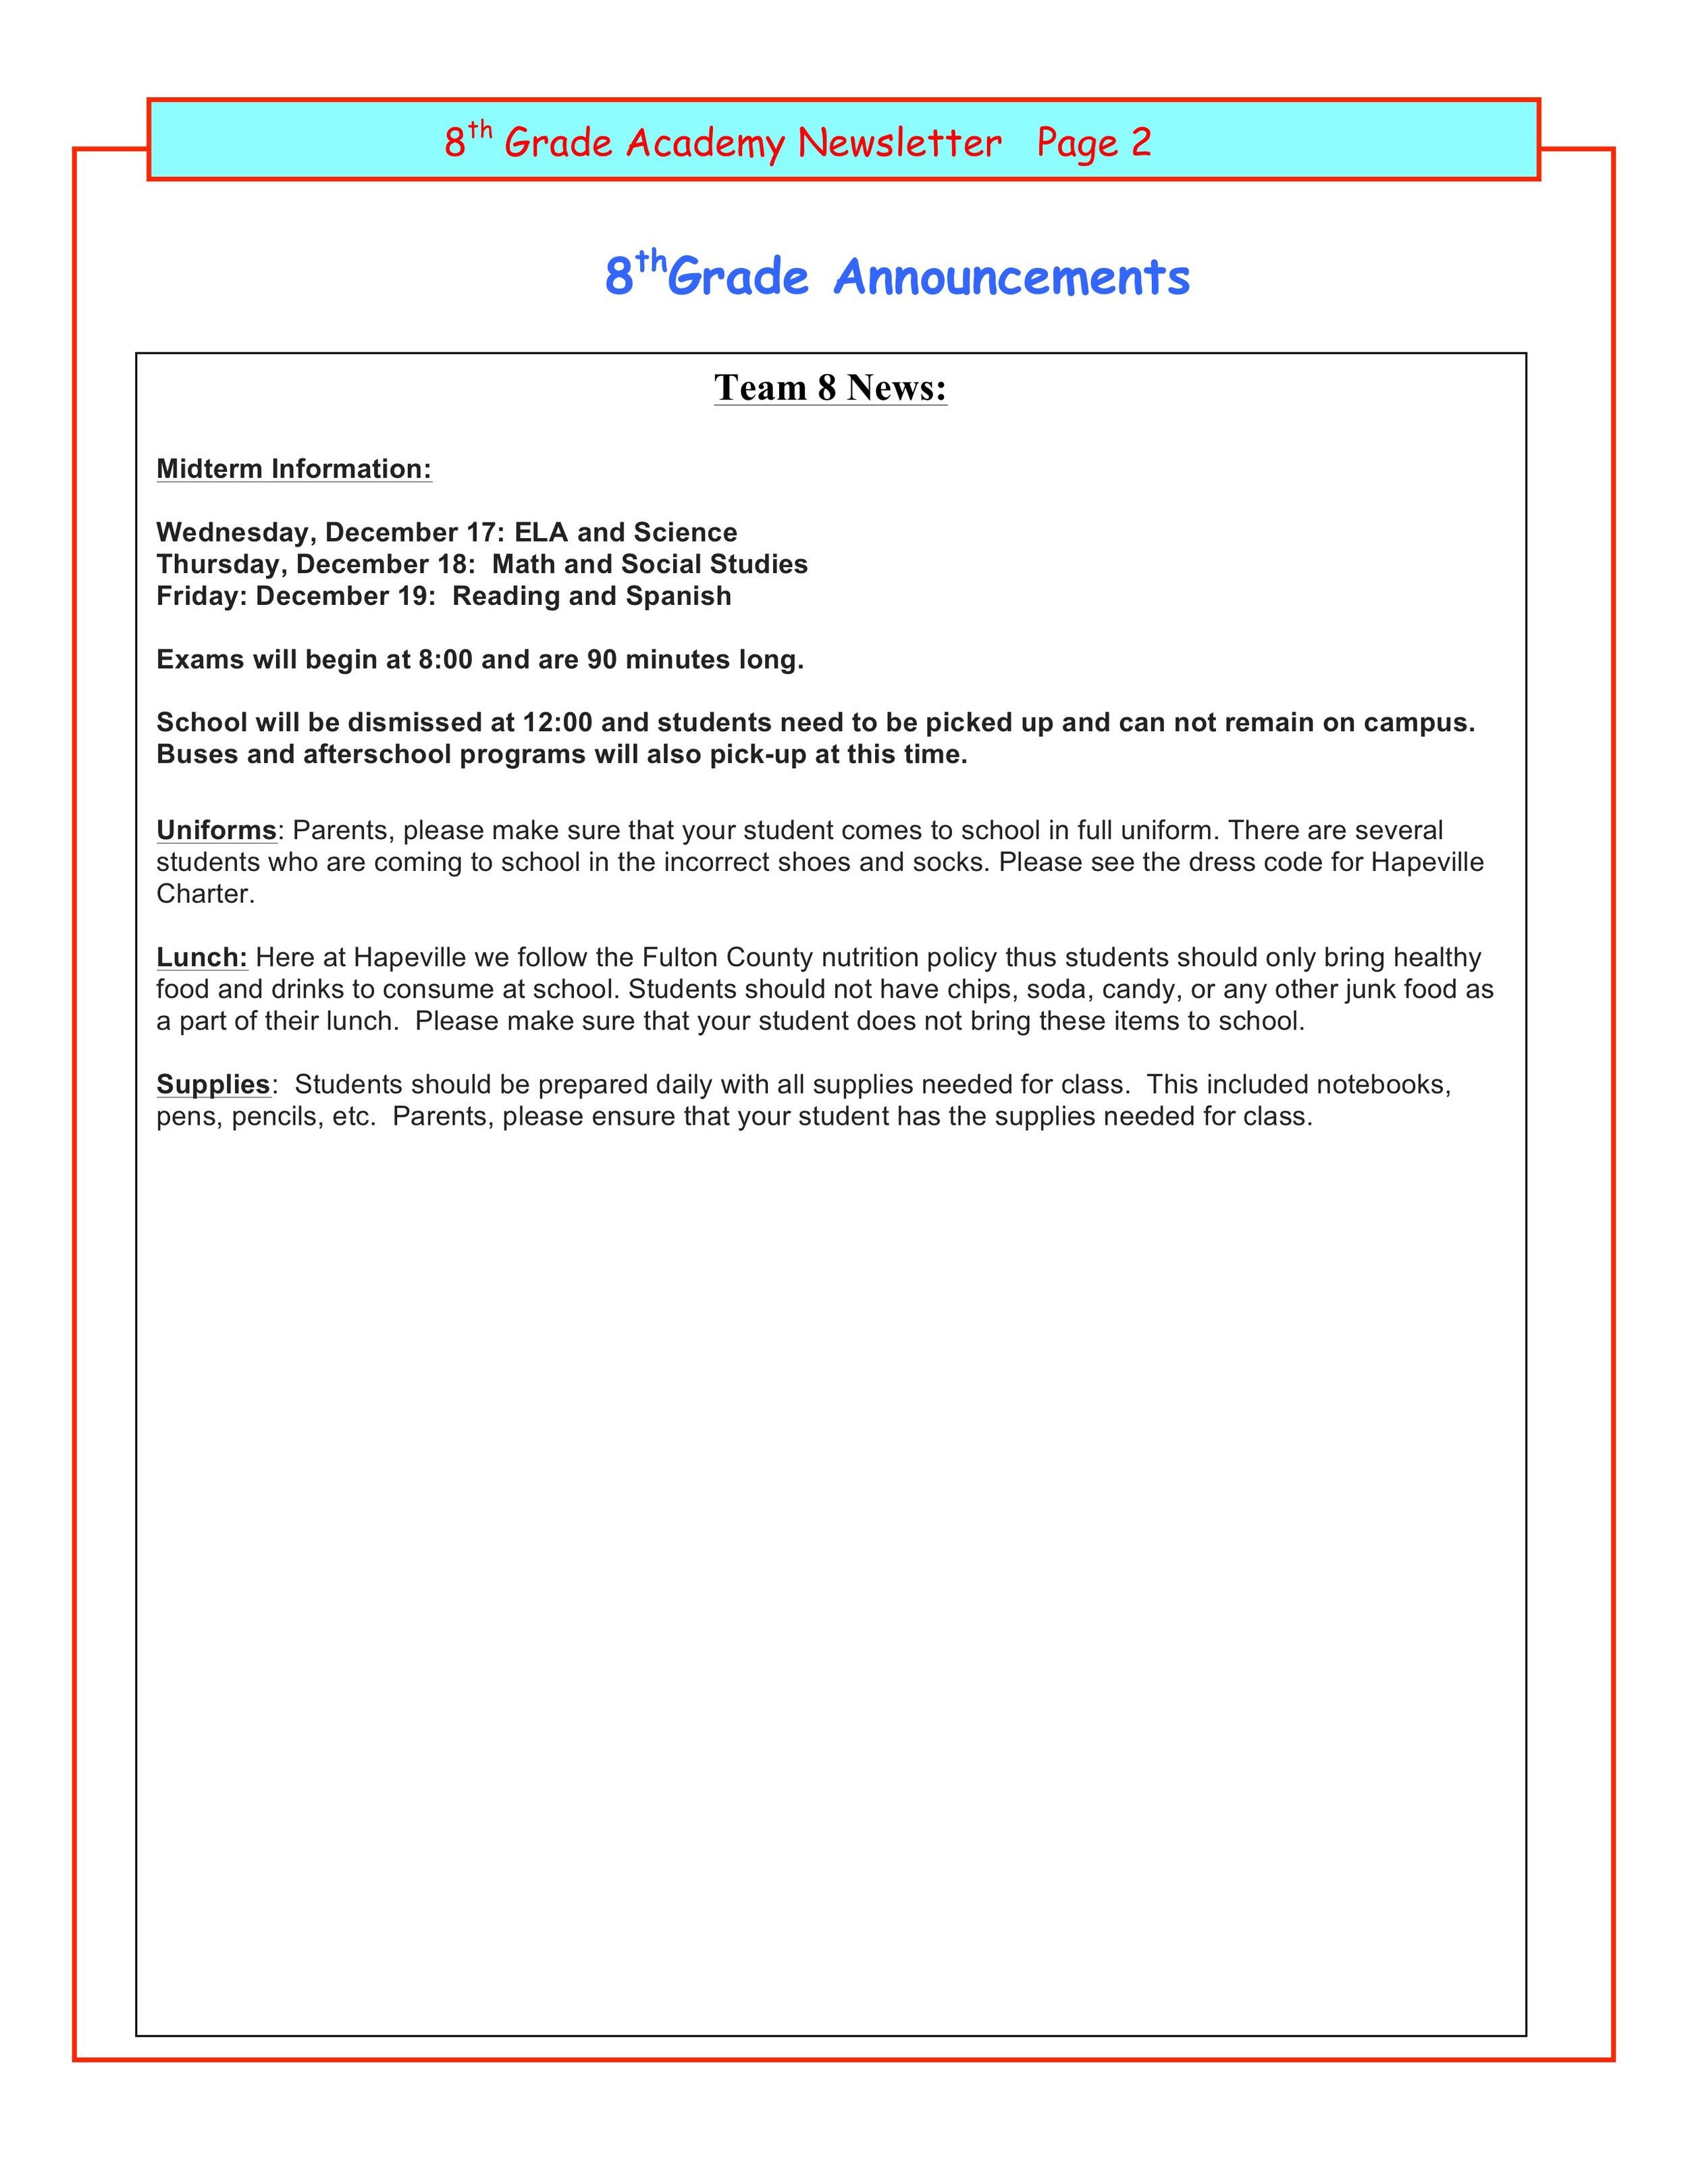 Newsletter Image8th grade December 15 2.jpeg